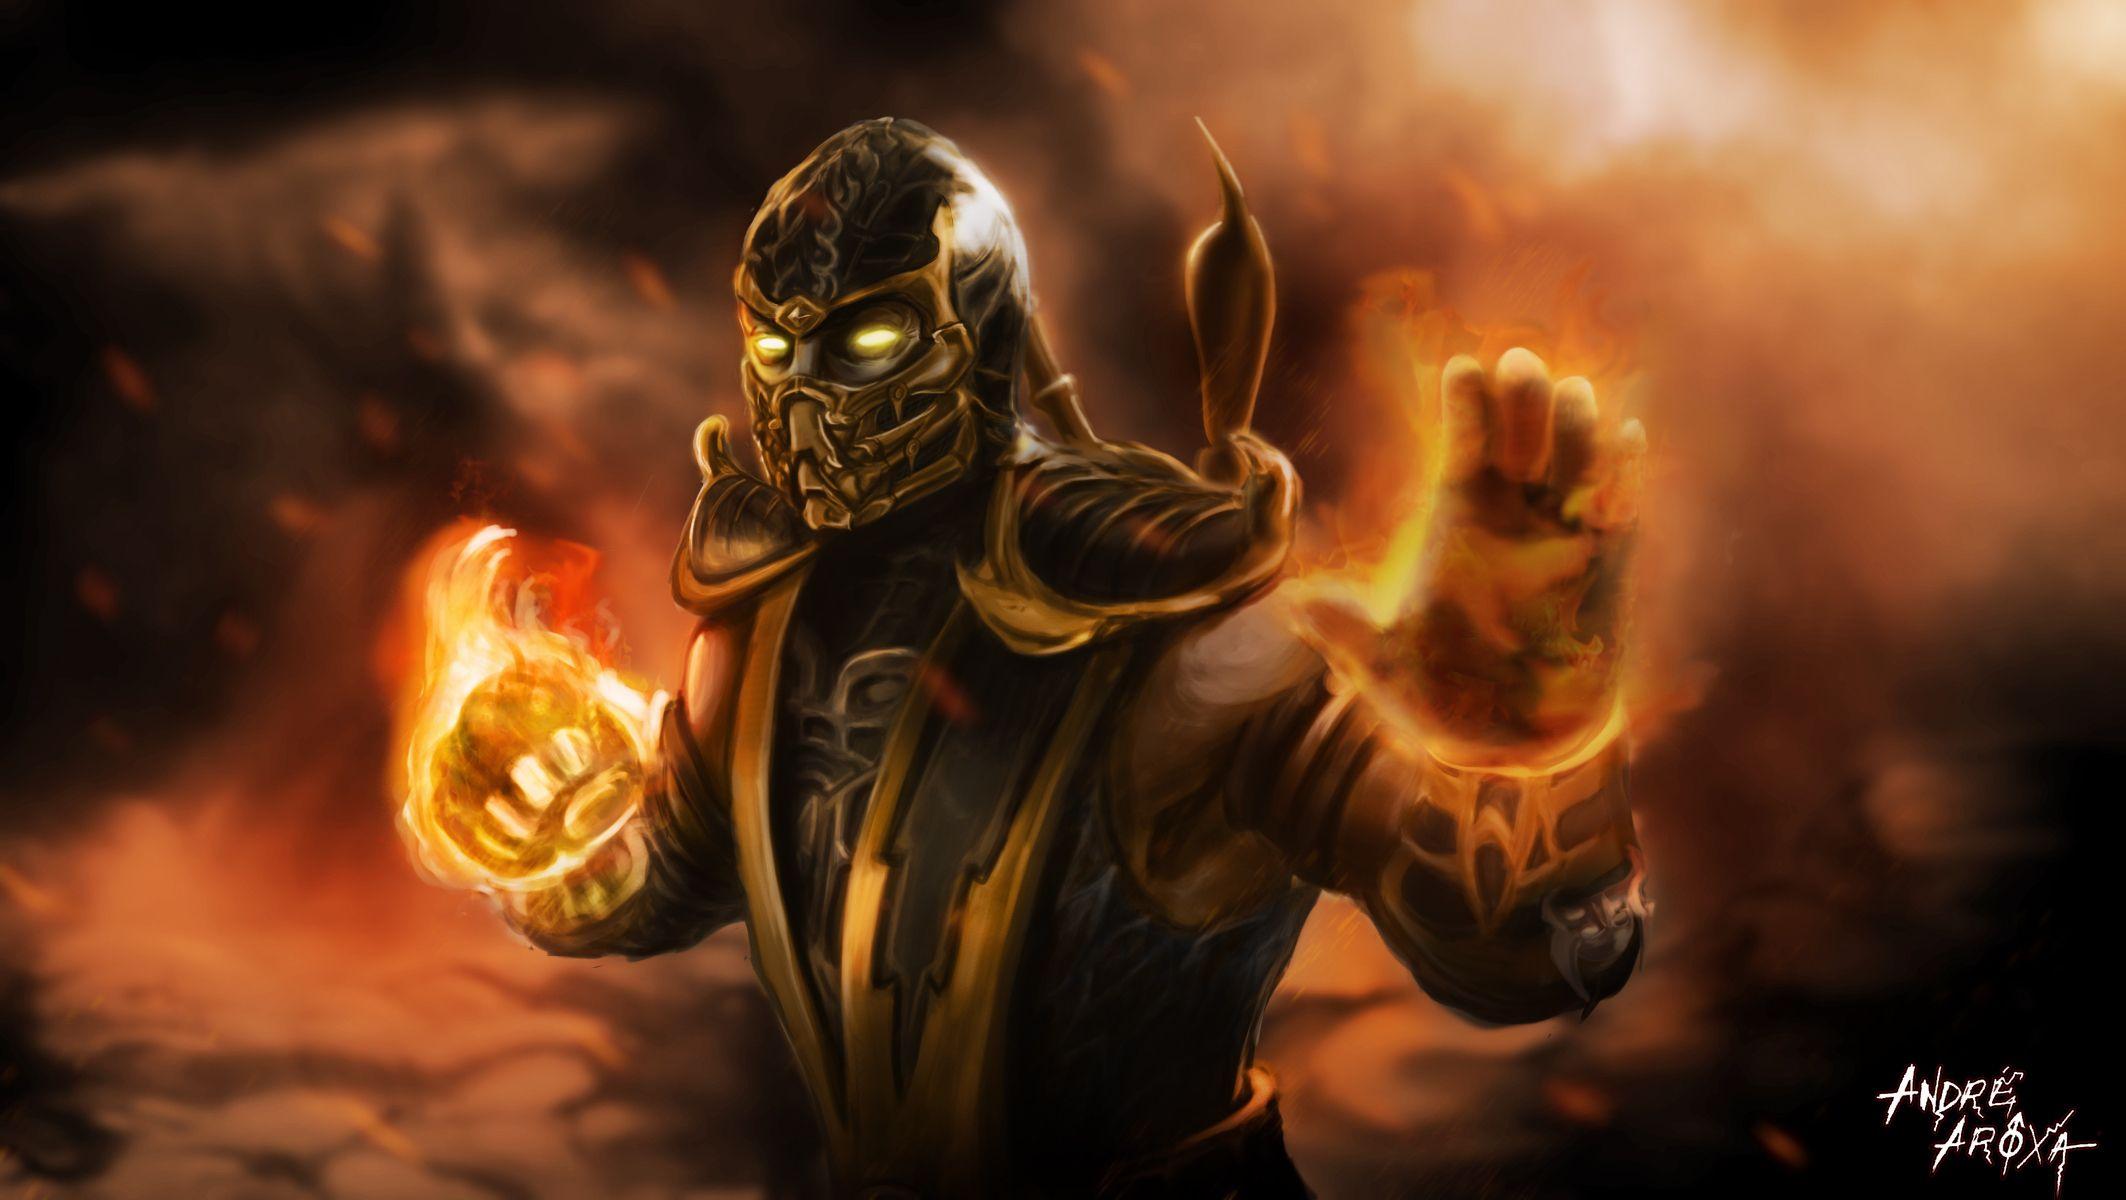 Mortal Kombat Scorpion Wallpaper Desktop Scorpion Mortal Kombat